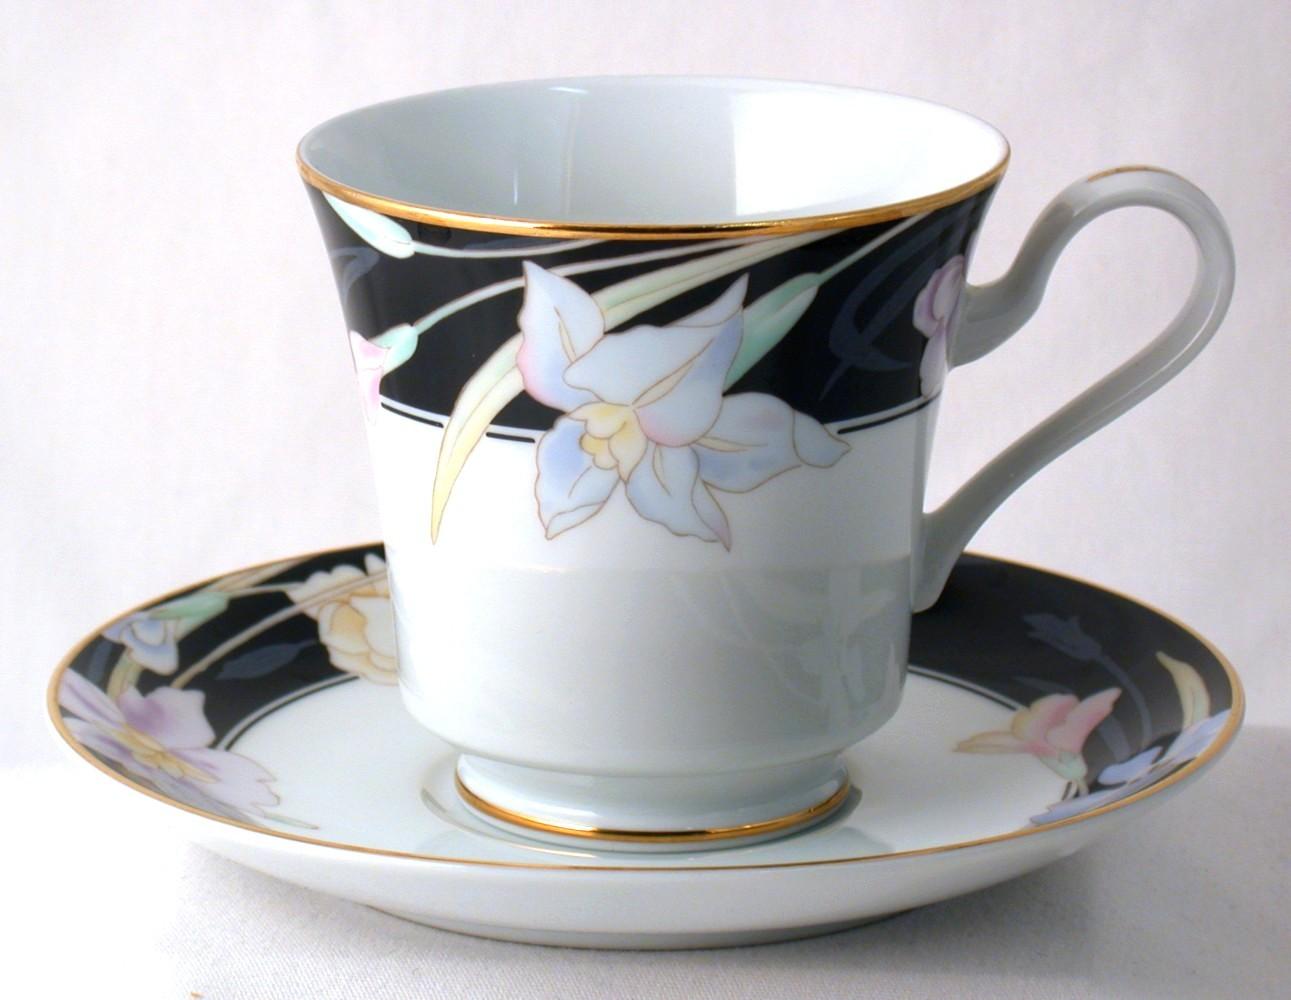 Mikasa Charisma Black Cup & Saucer Set New and 9 similar items